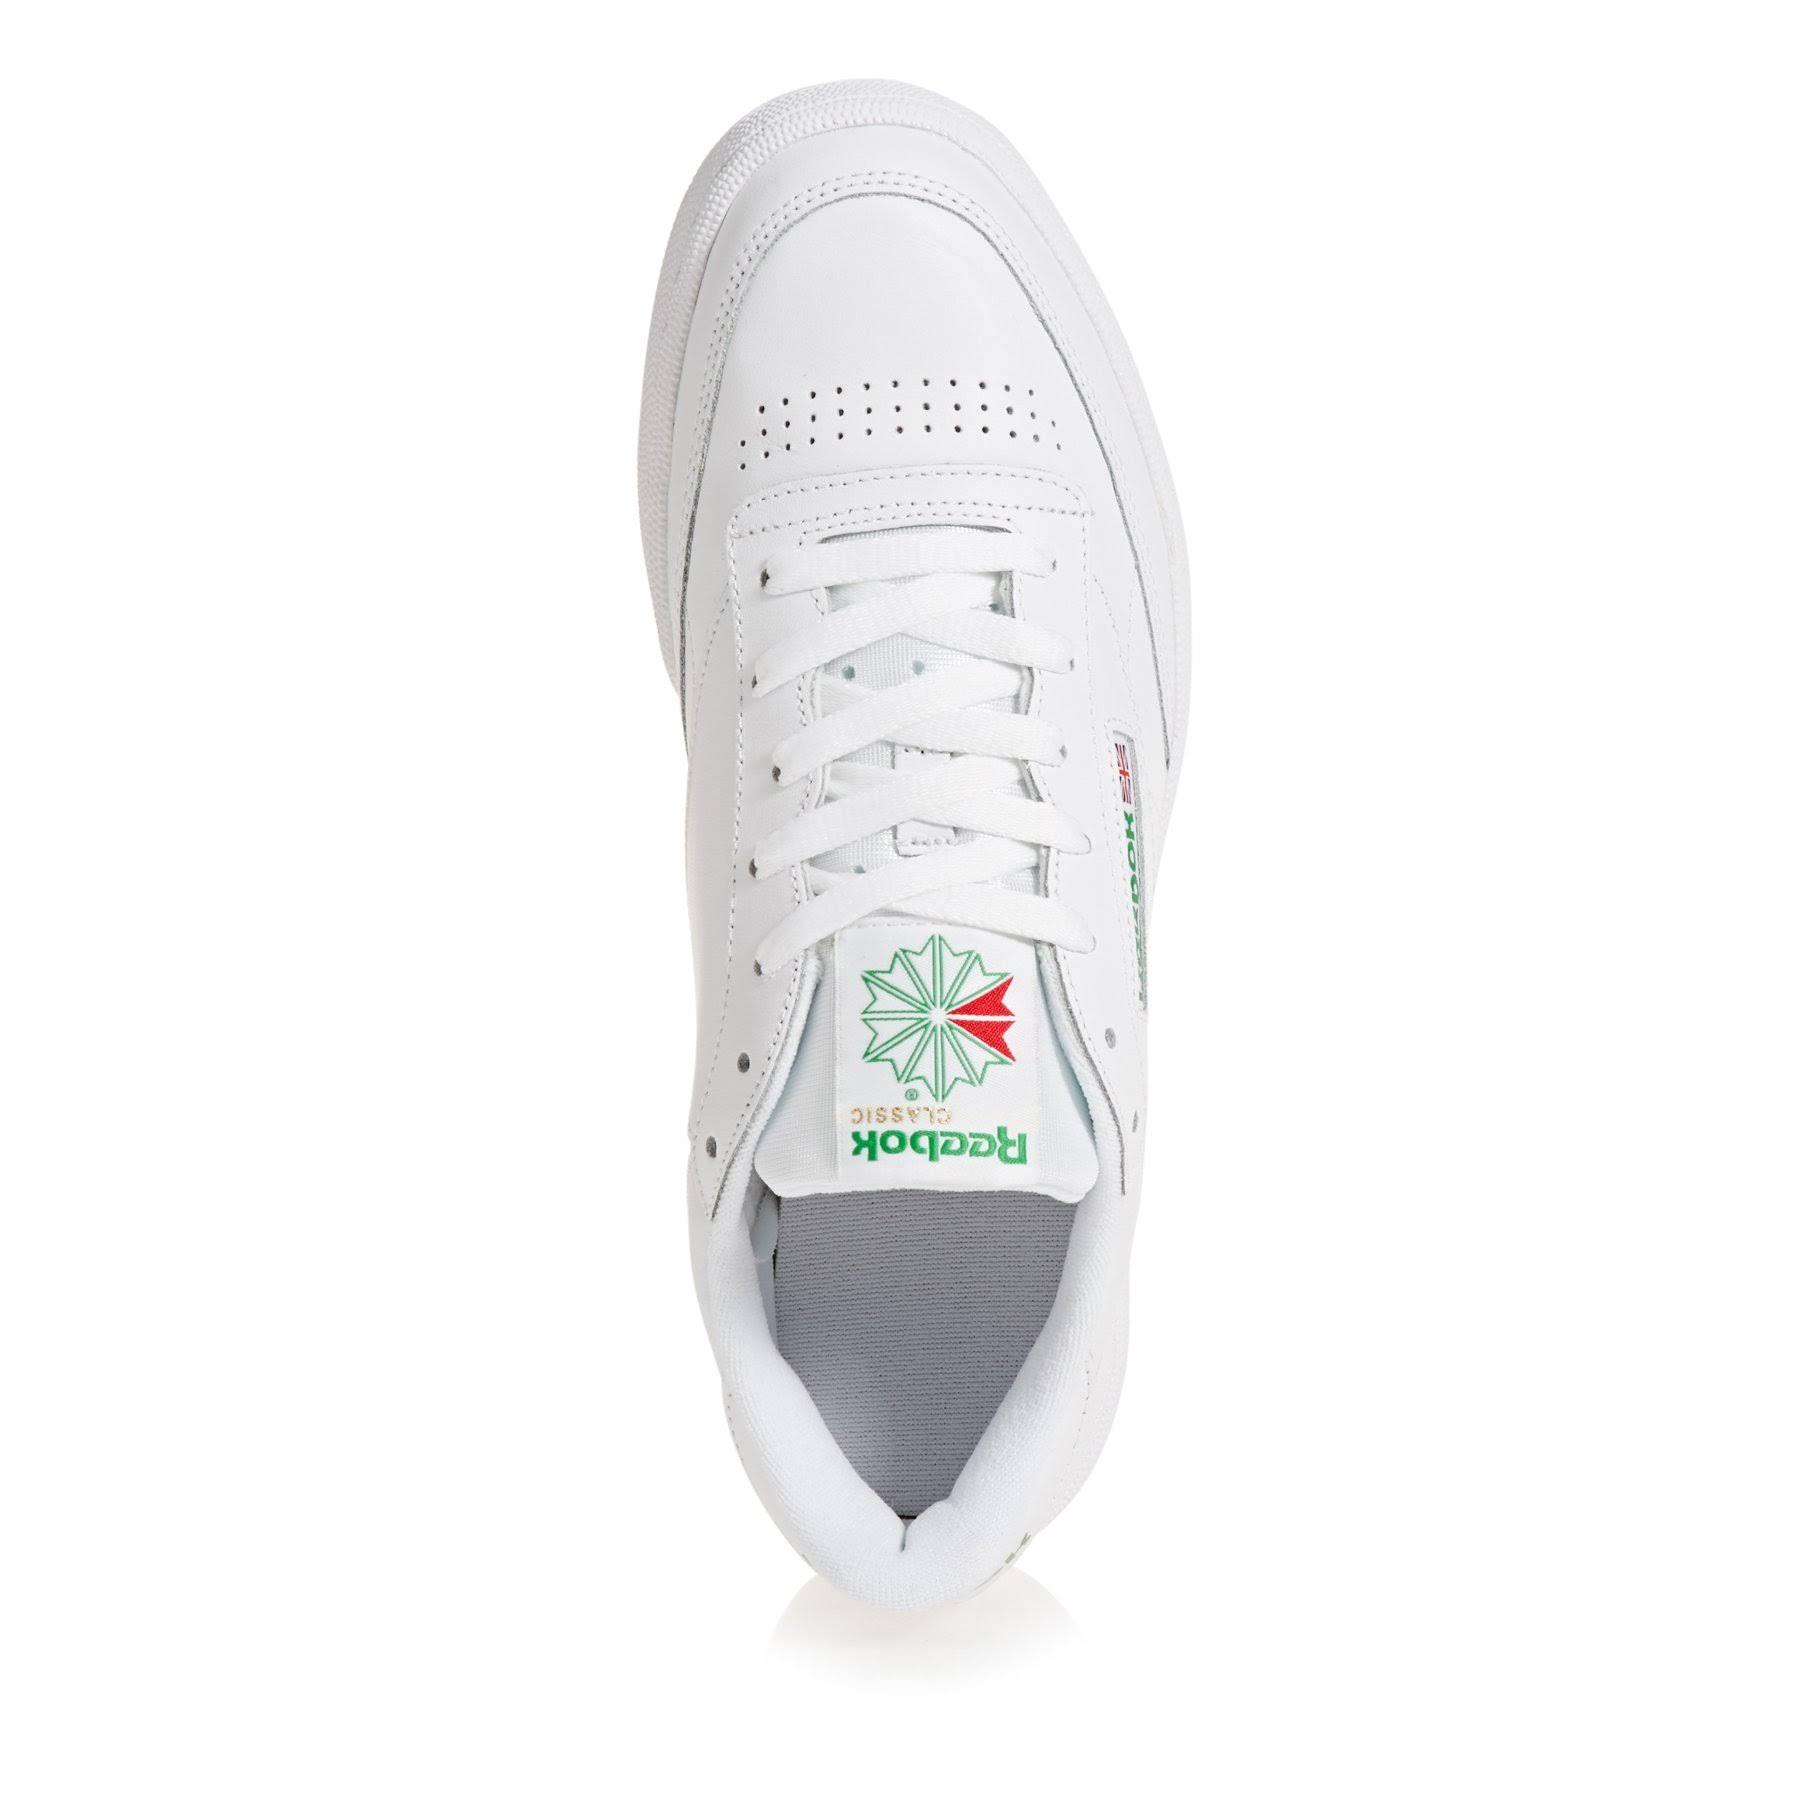 C Club Bianco verde 85 Reebok 8y0vnwmNO